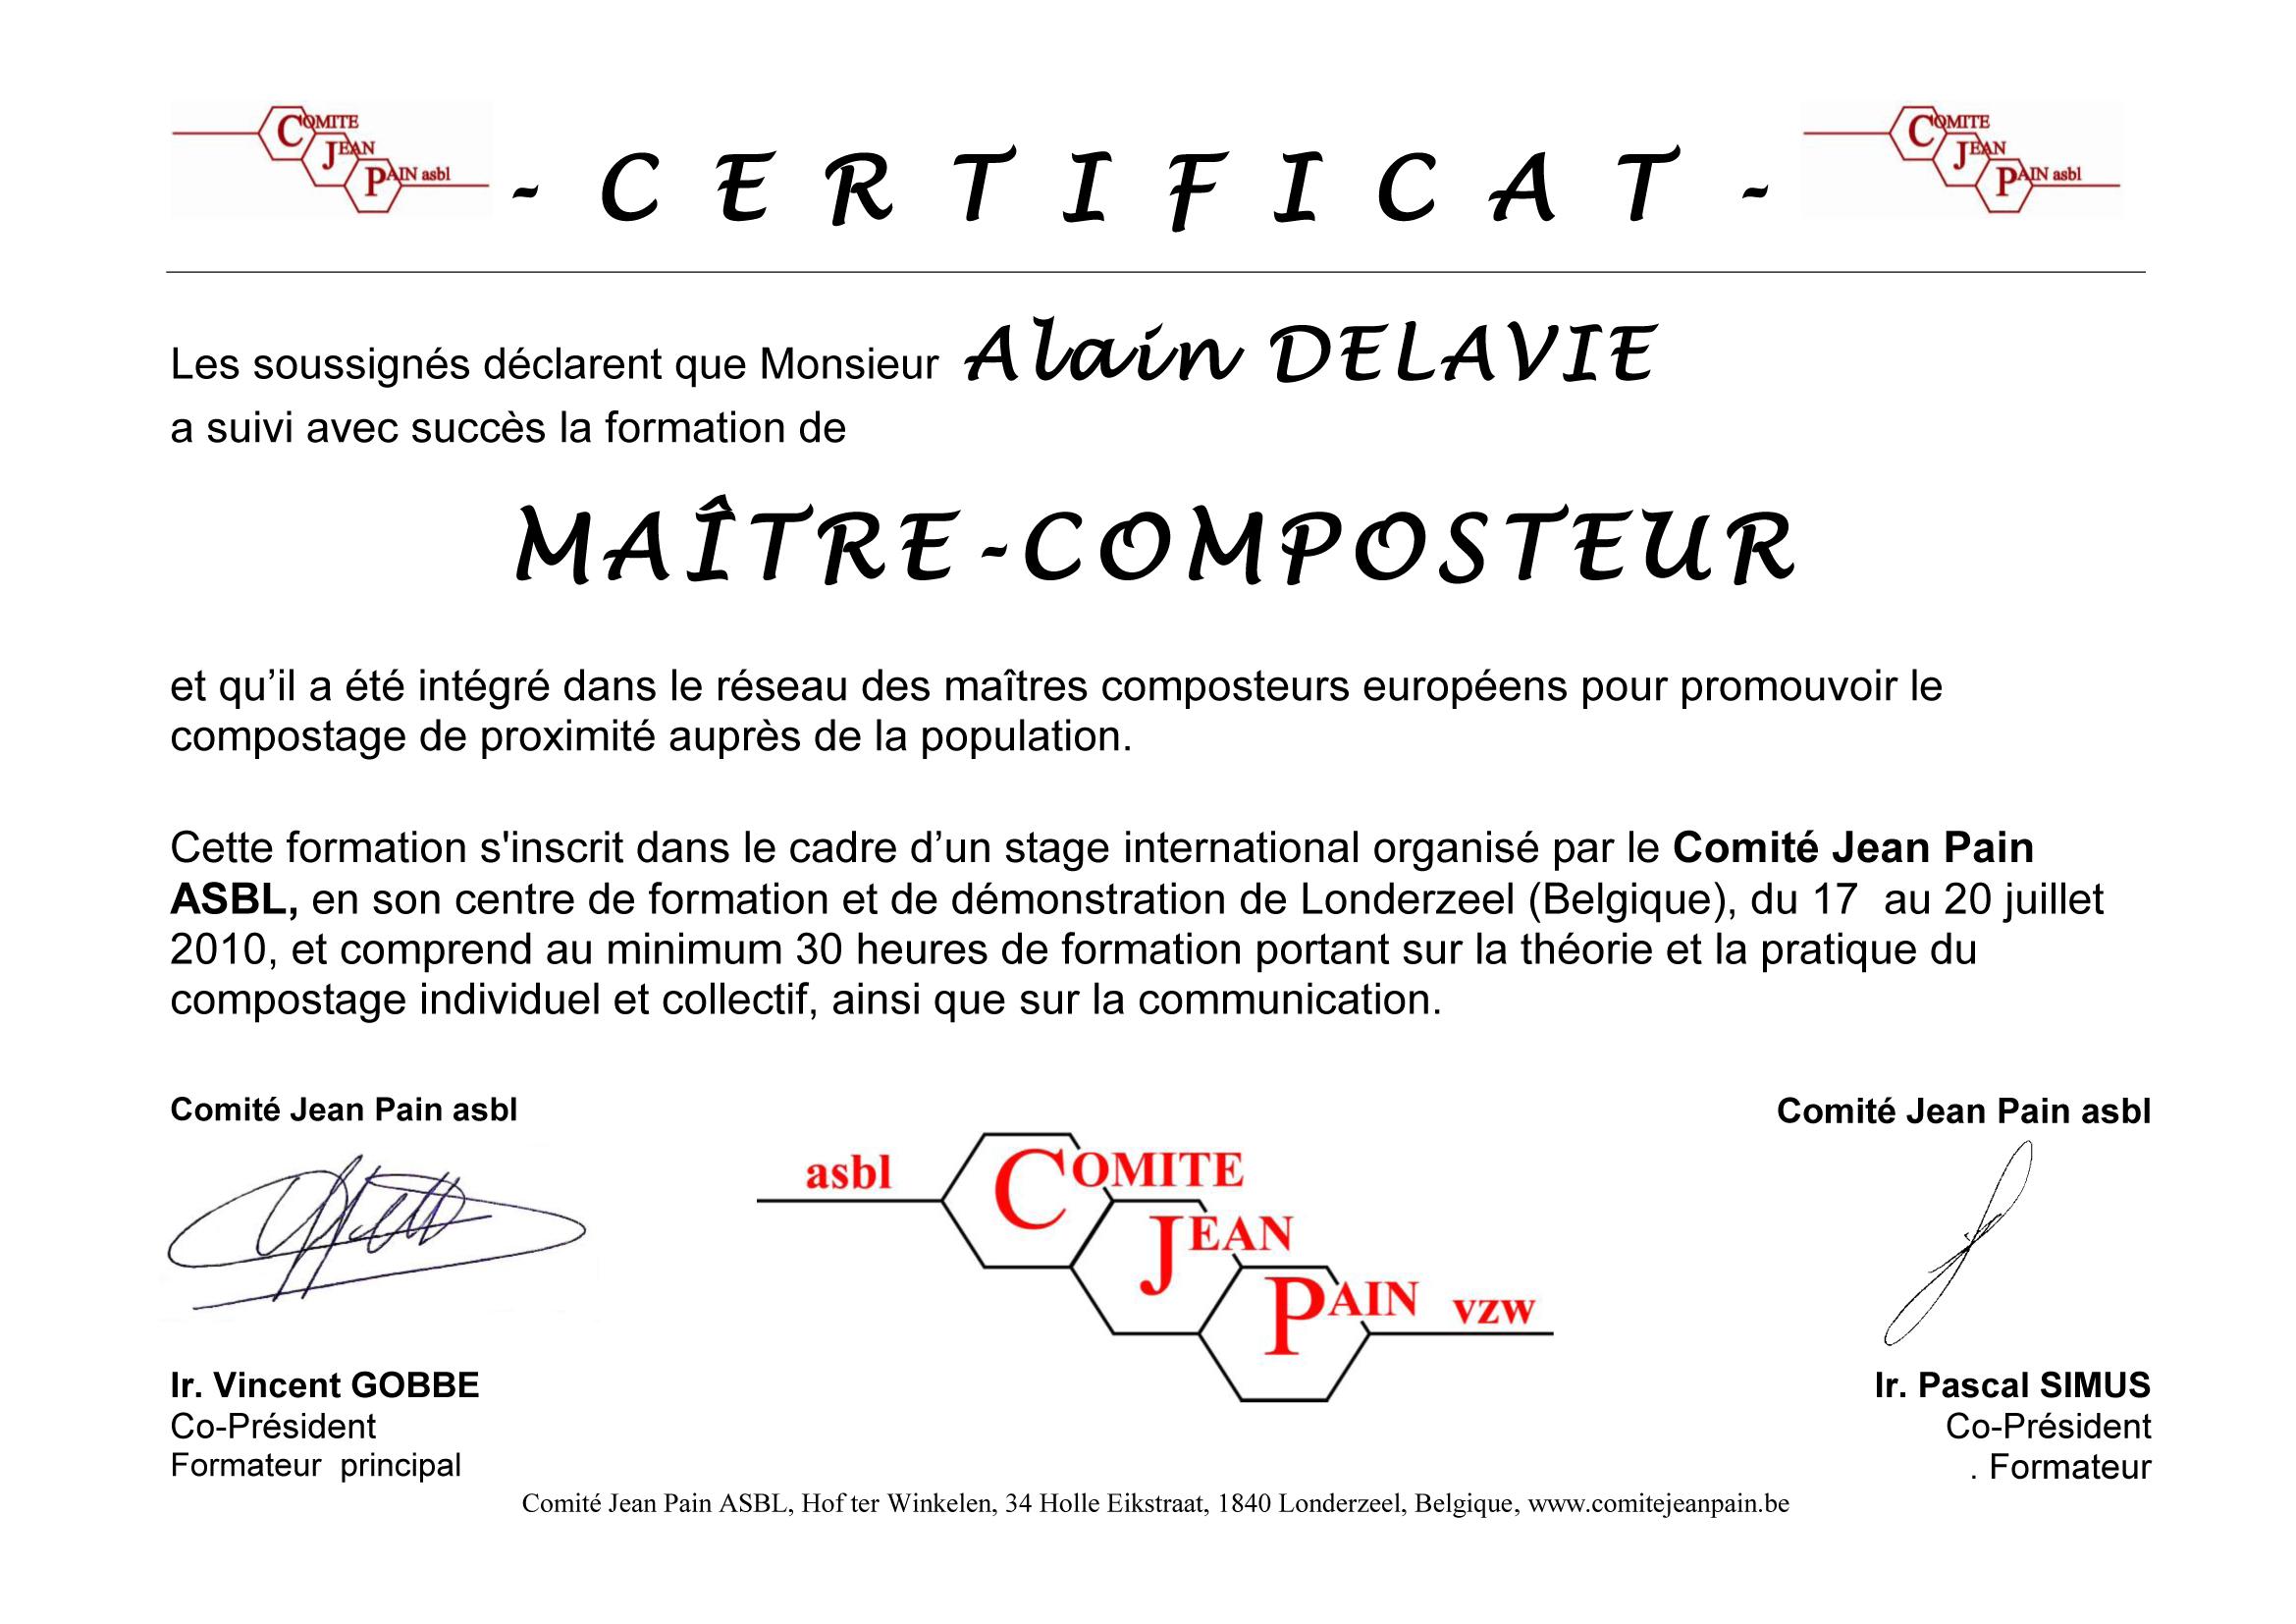 certificat-delavie-alain